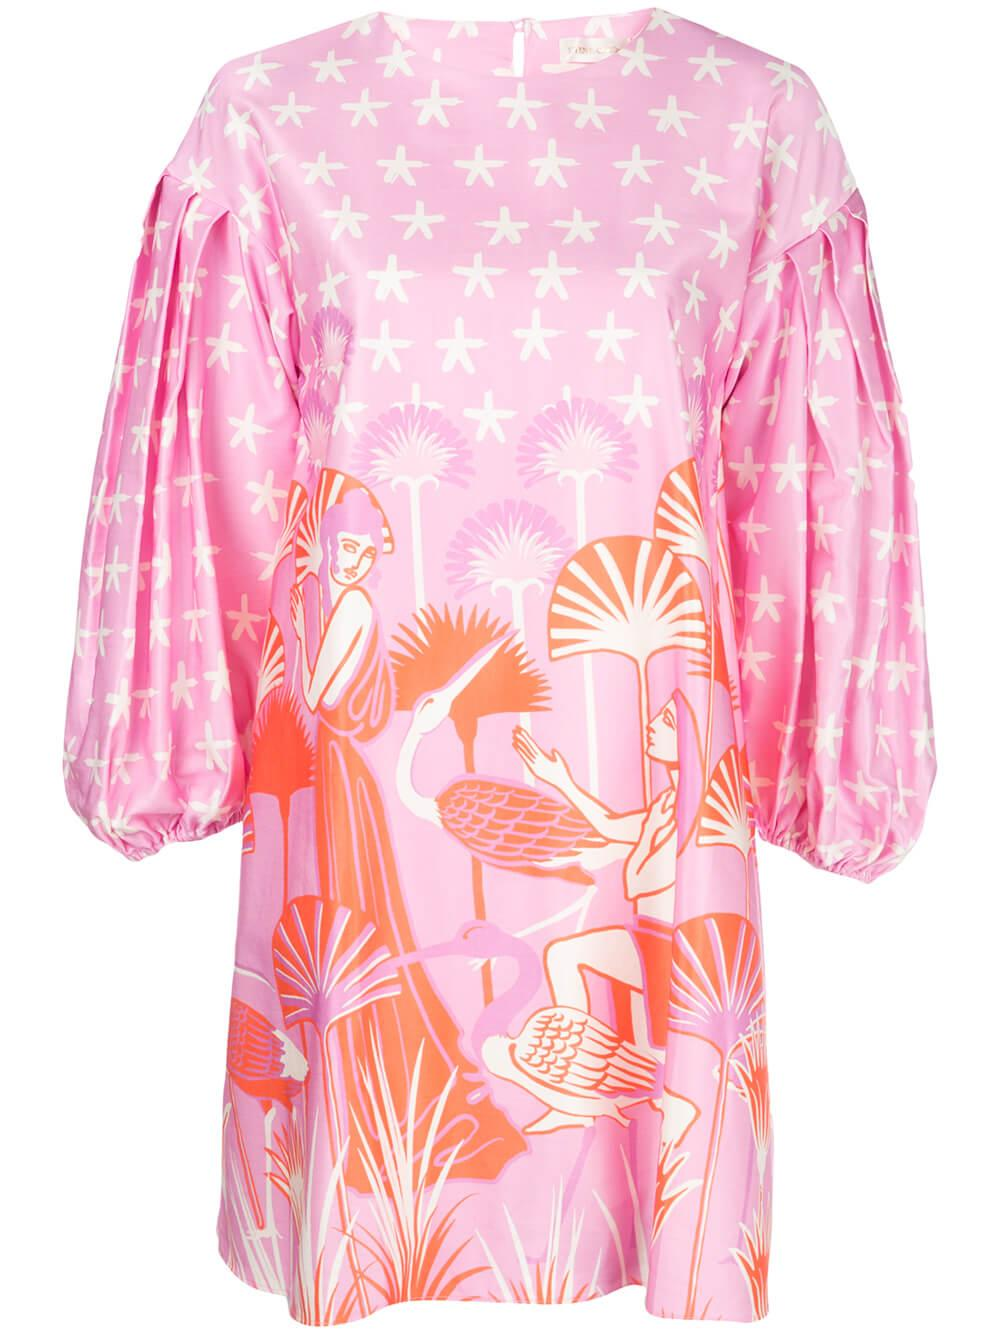 Francis Aida Print Dress Item # SG2821